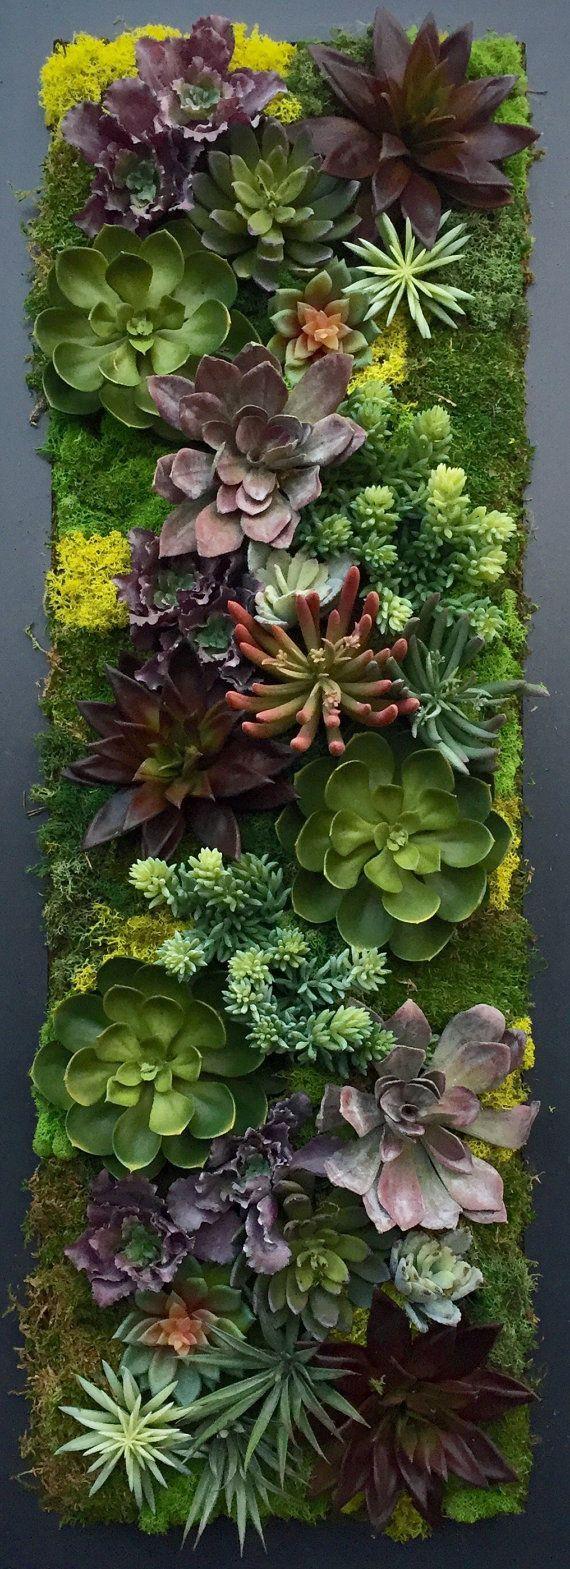 Custom made succulent wall art living room decor ideas pinterest